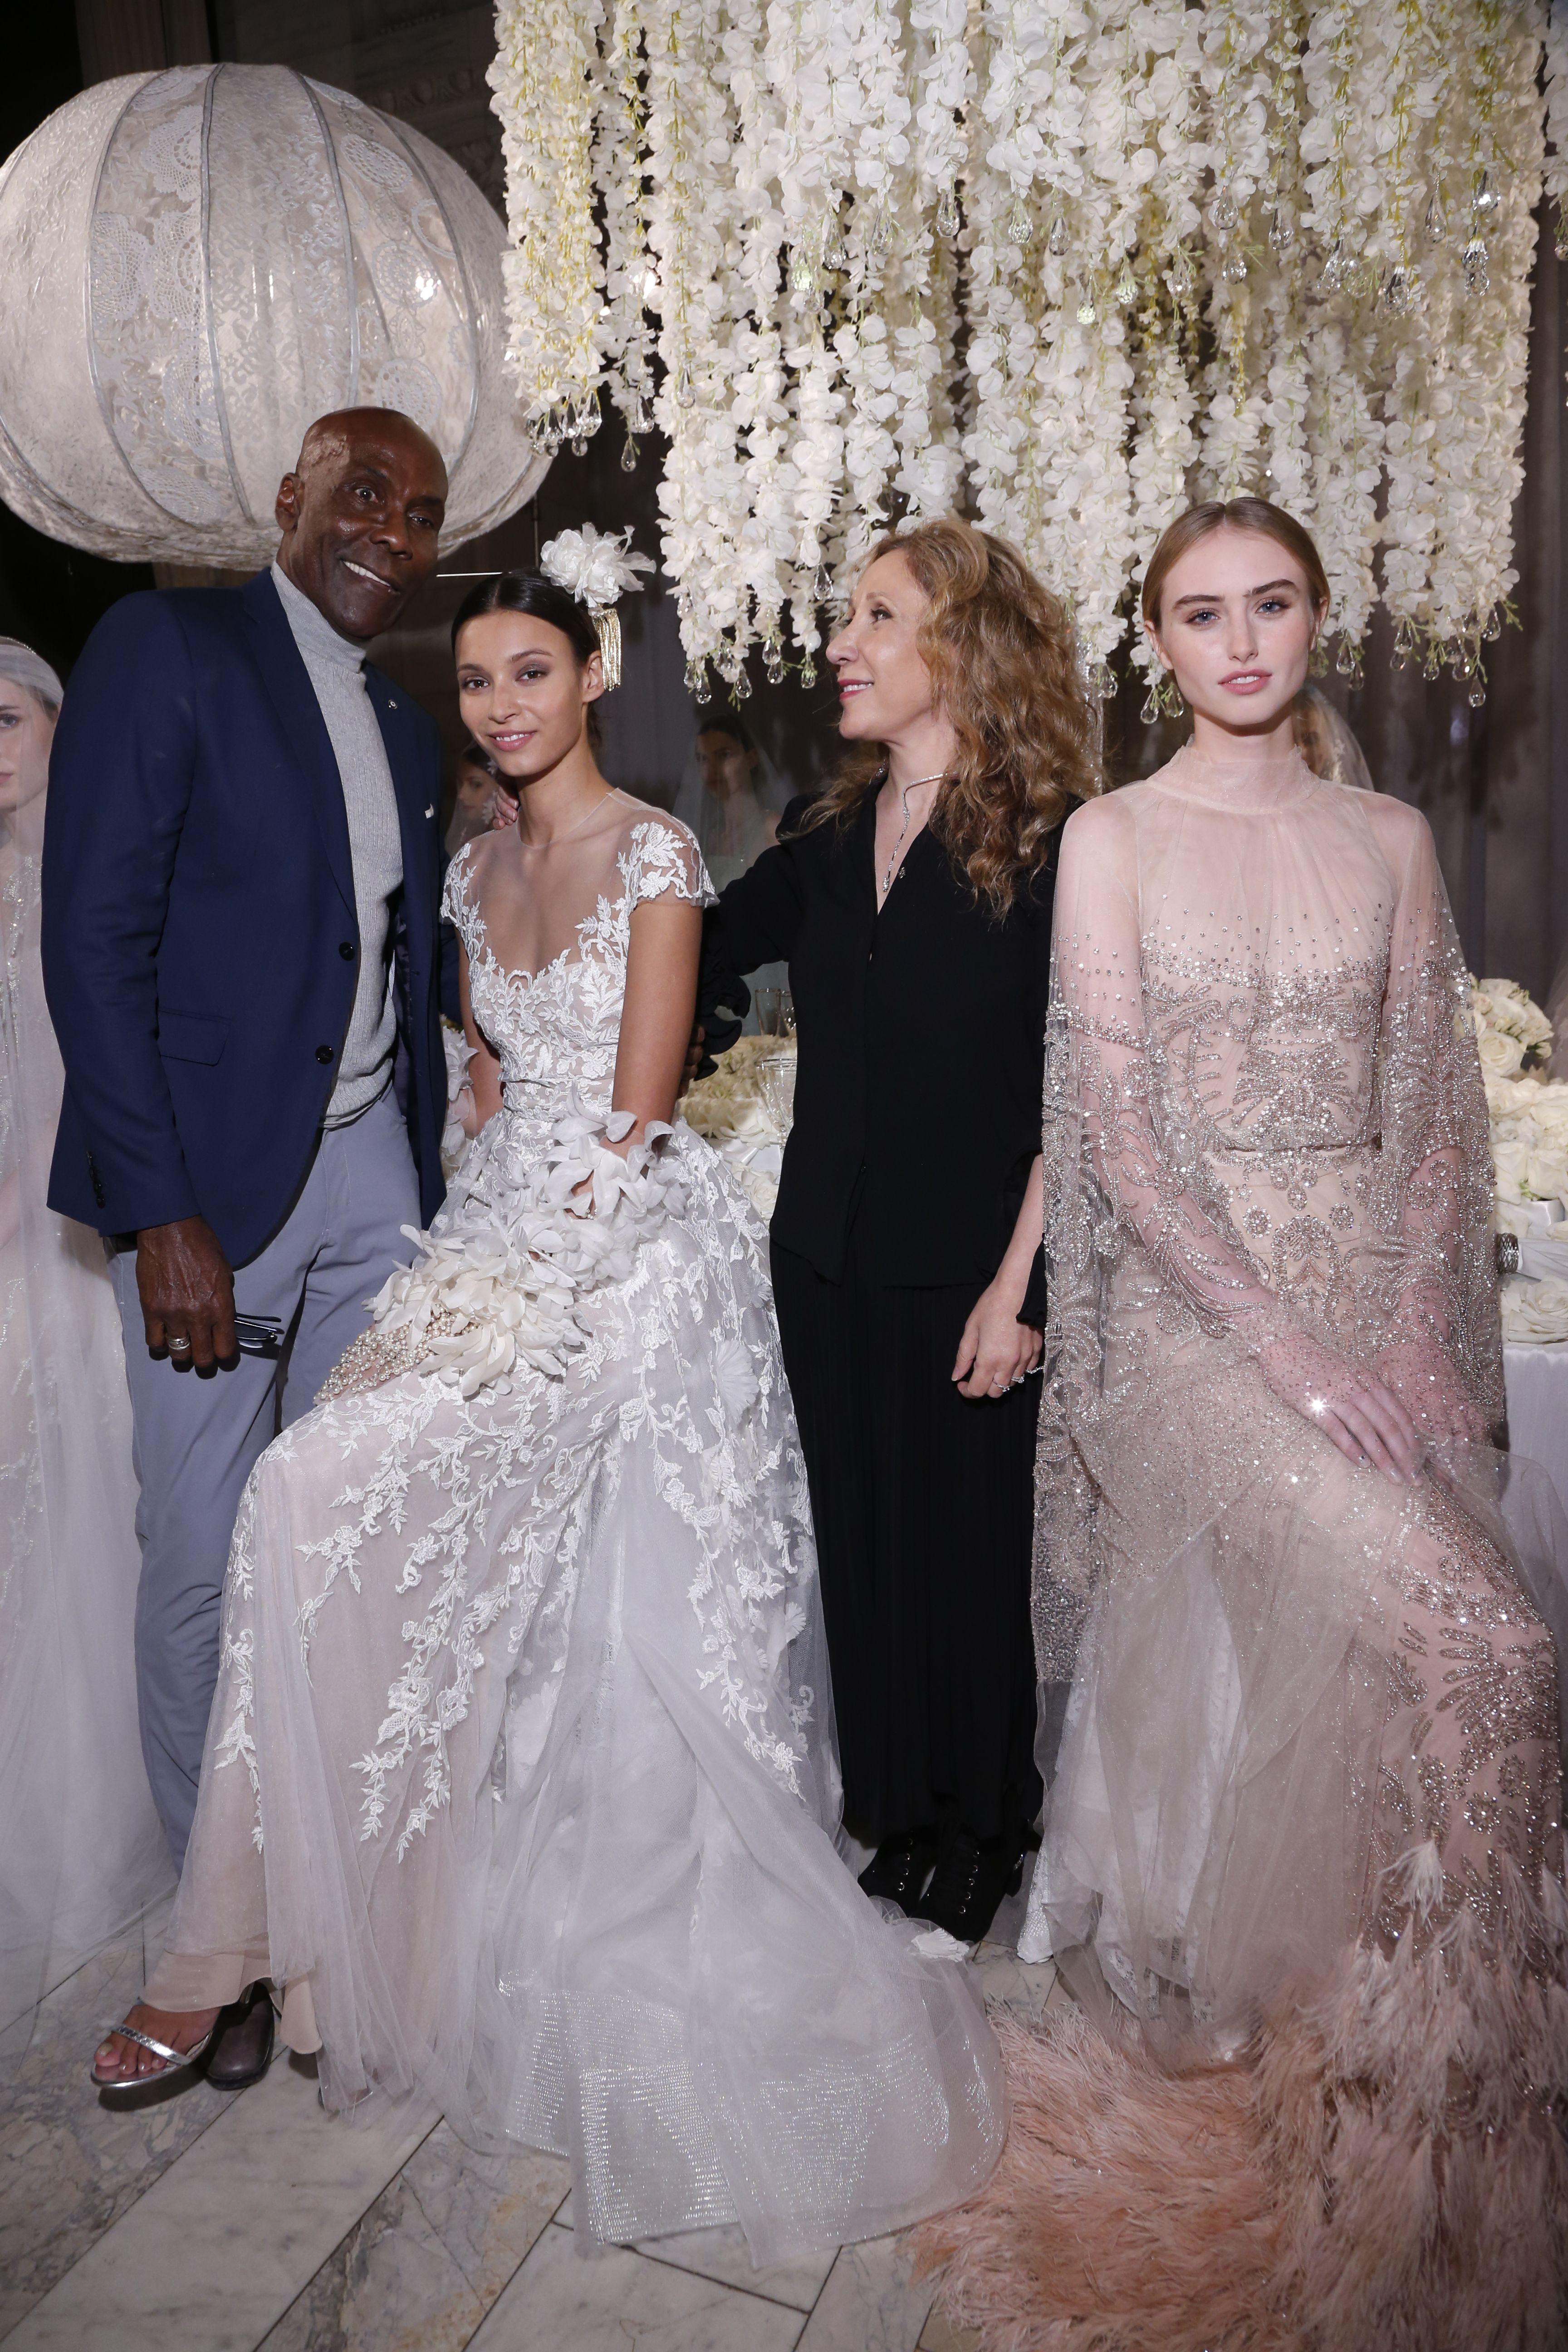 Reem Acra X Preston Bailey Thecelebrationcollection Reemacra Prestonbailey Wedding Dresses Lace Preston Bailey Reem Acra